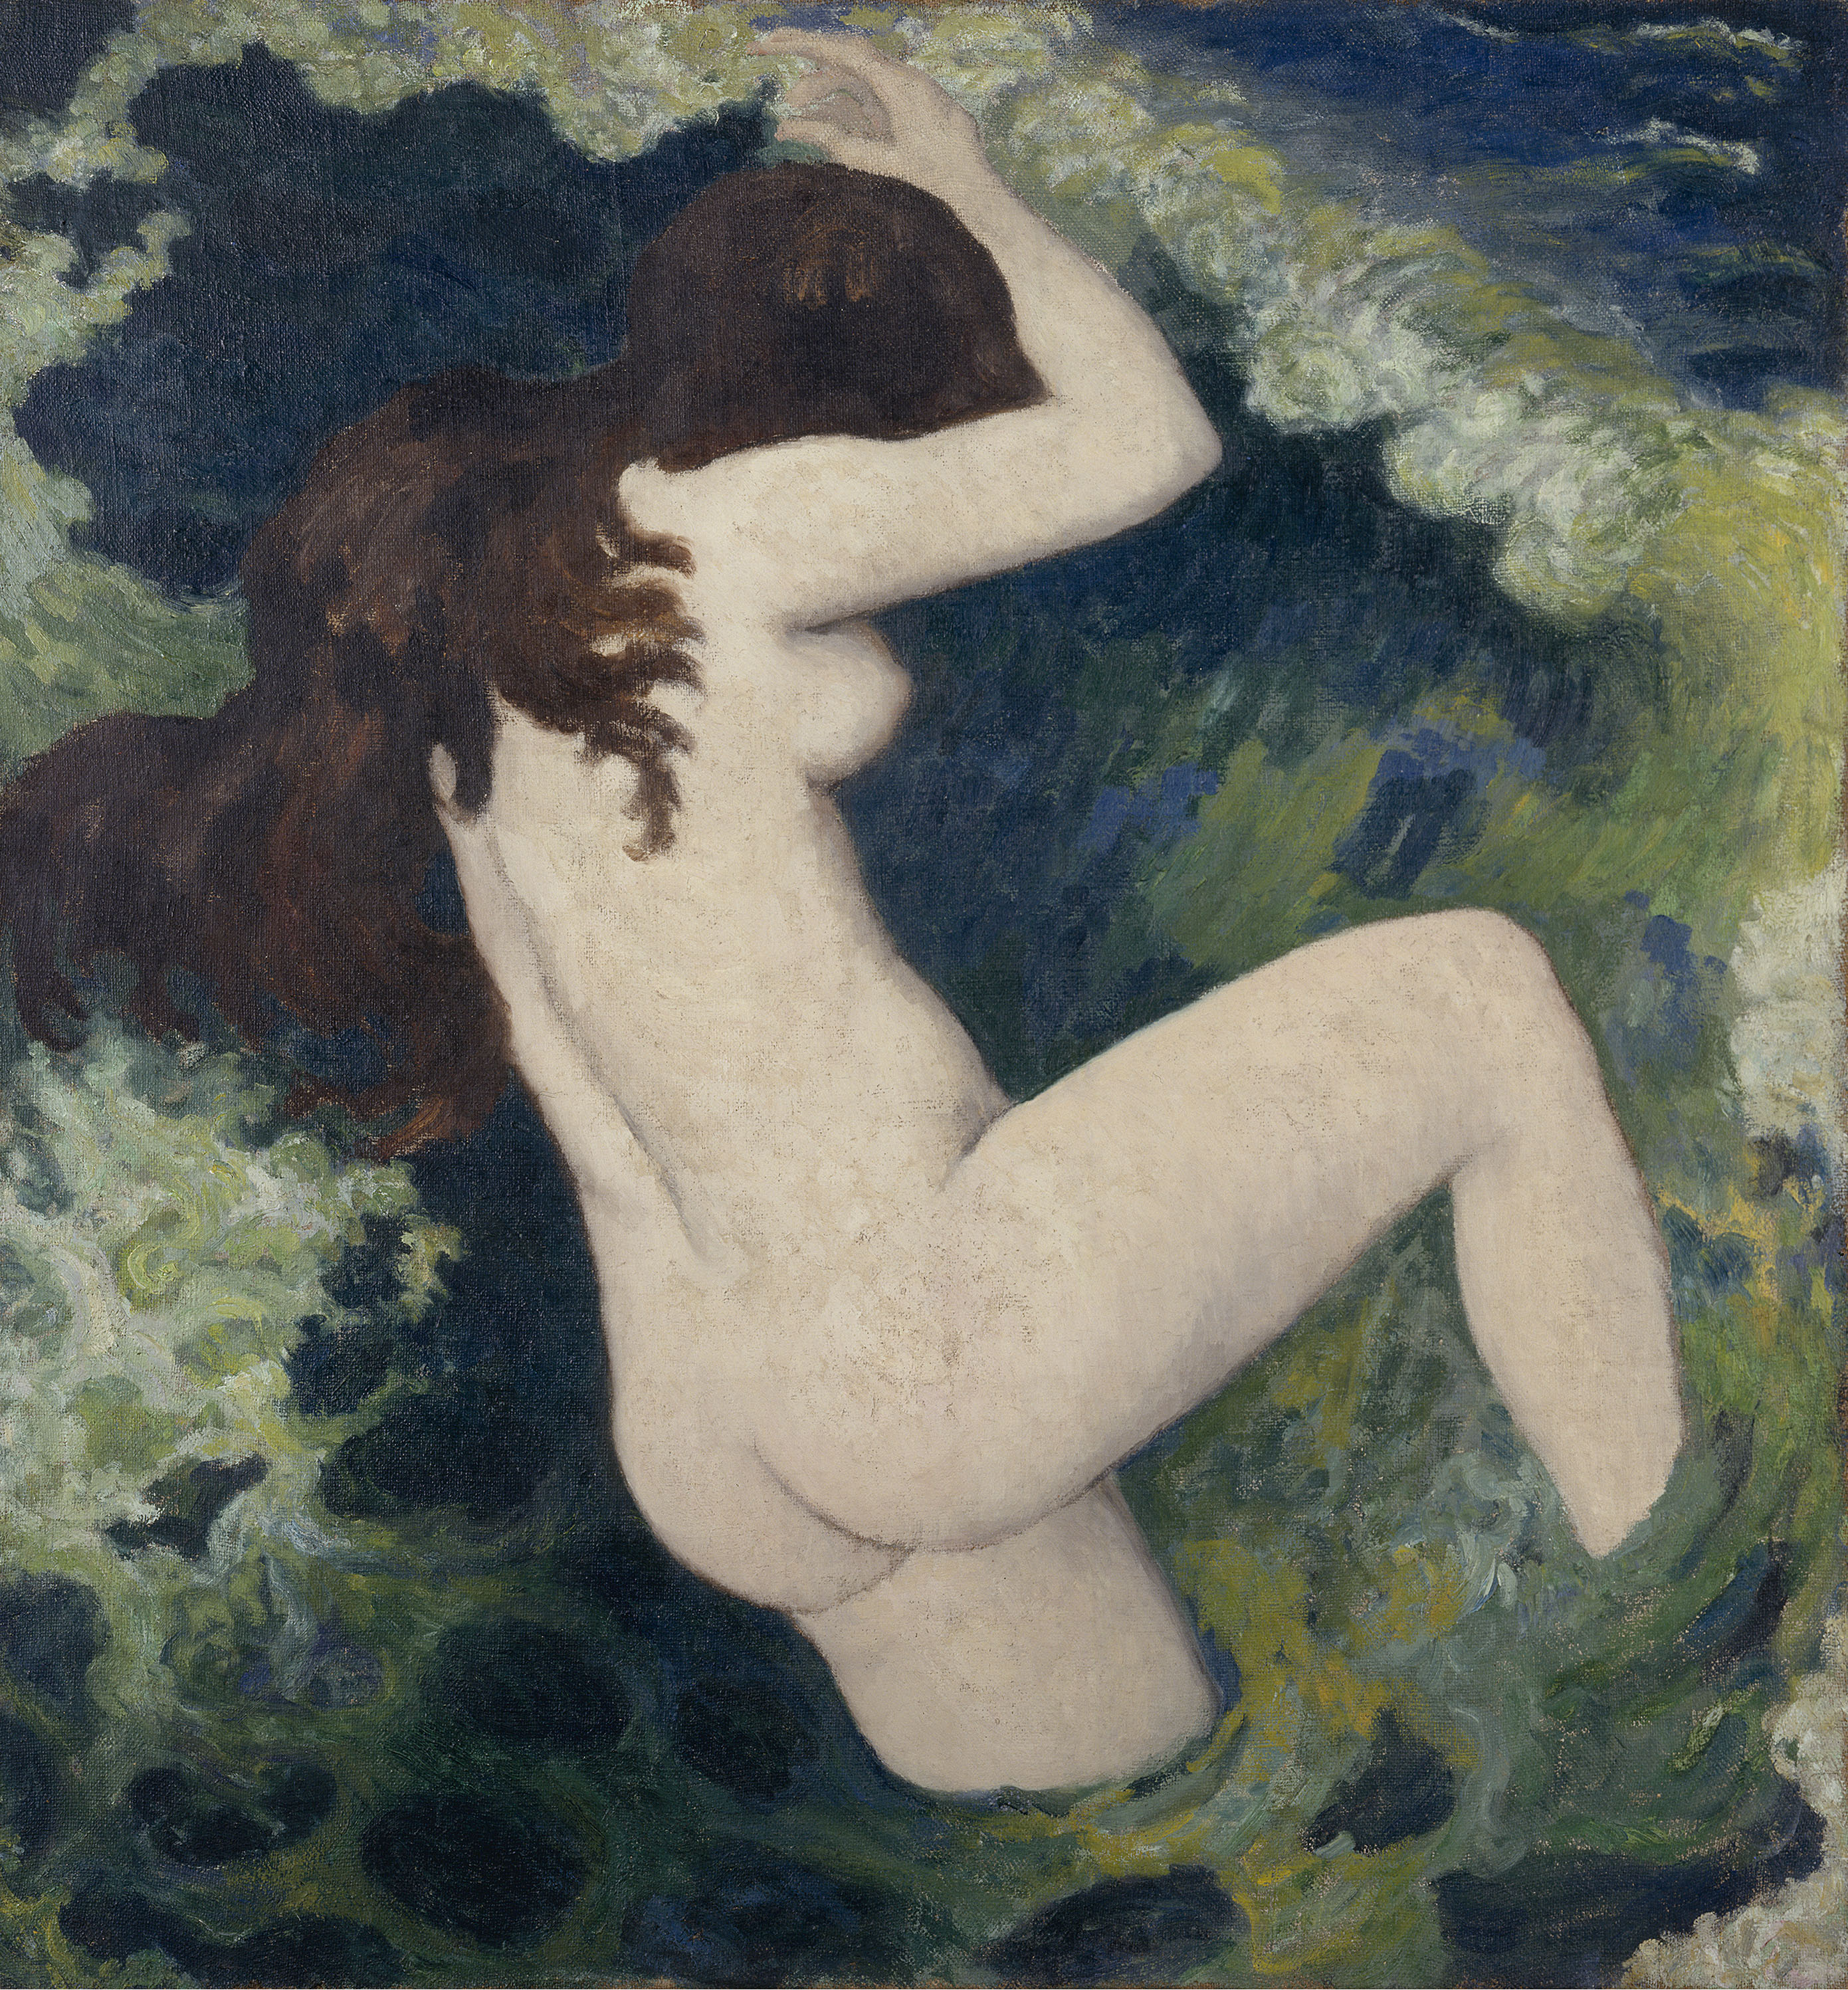 Aristide Maillol - La vague